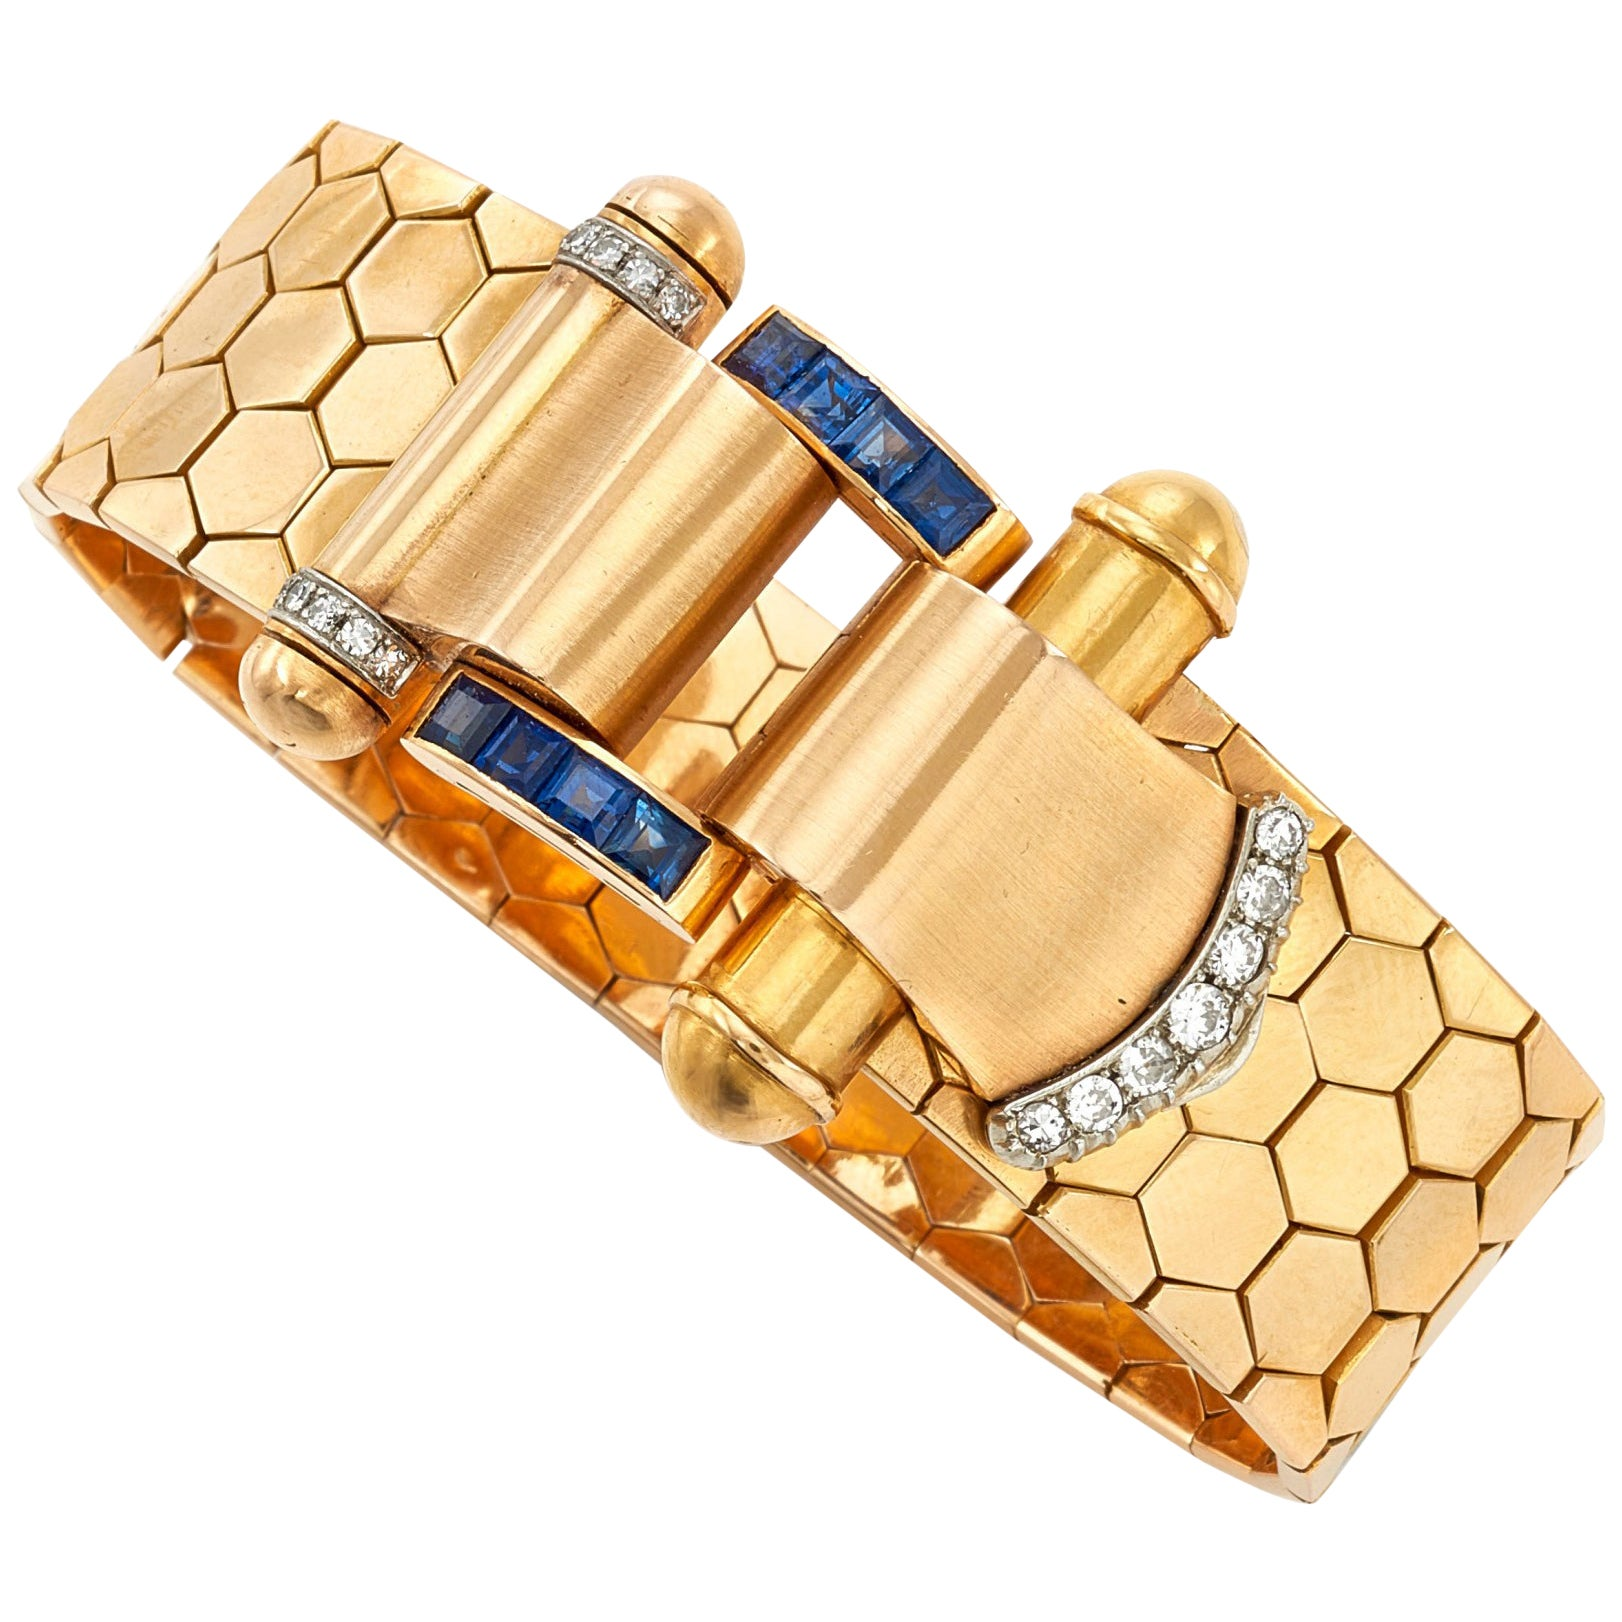 Set Sapphire and Diamond Bracelet, 1940s